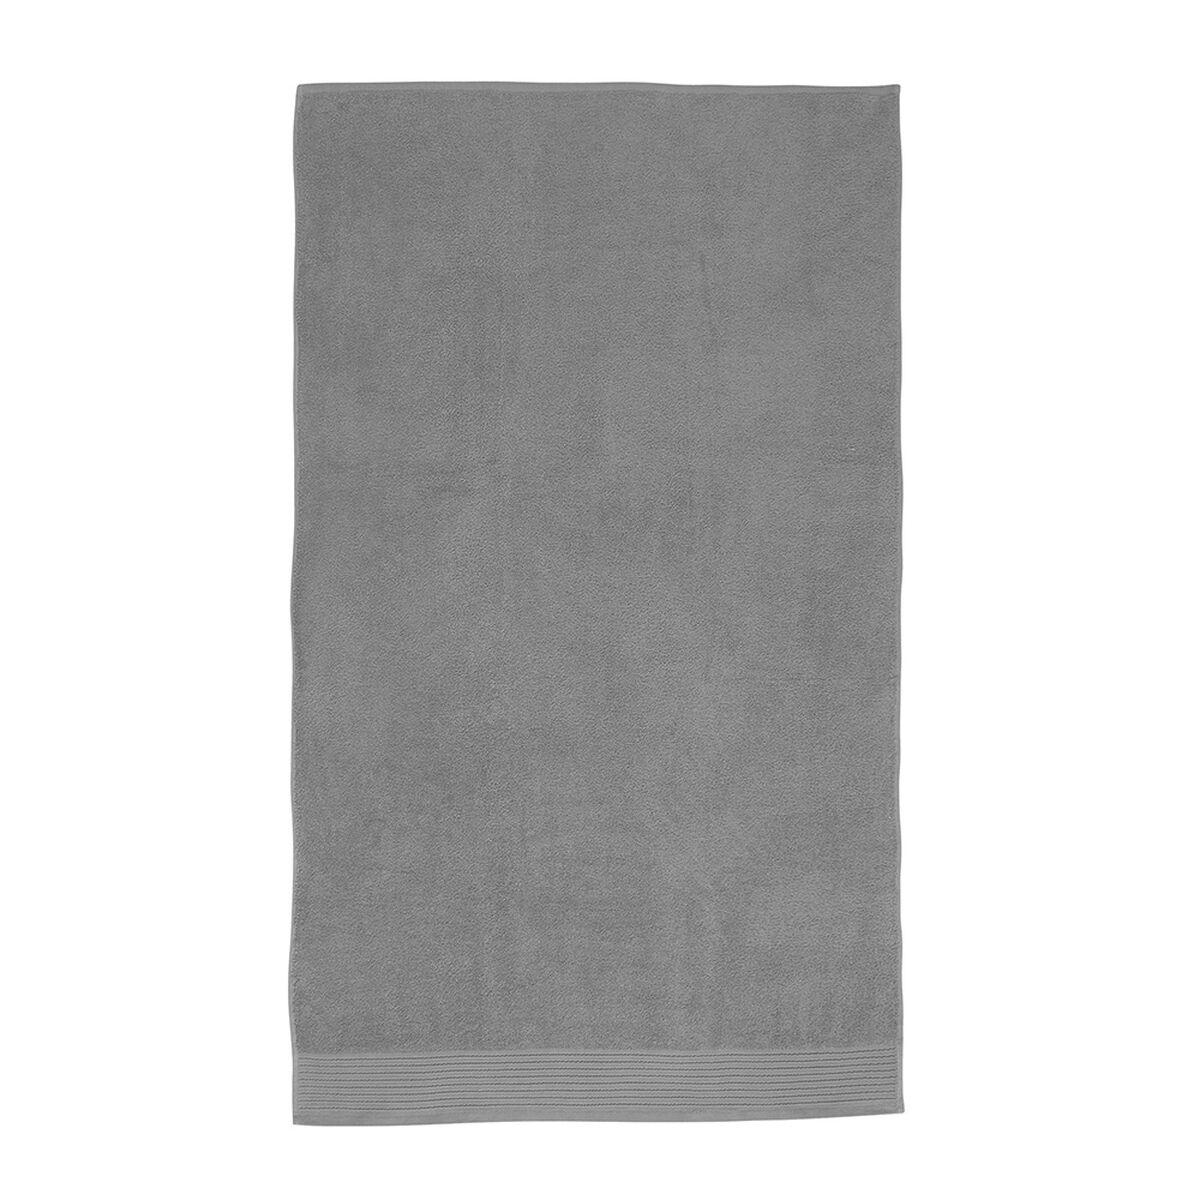 Toalla de Mano Mashini Liso 500 grs Gris 45 x 80 cm